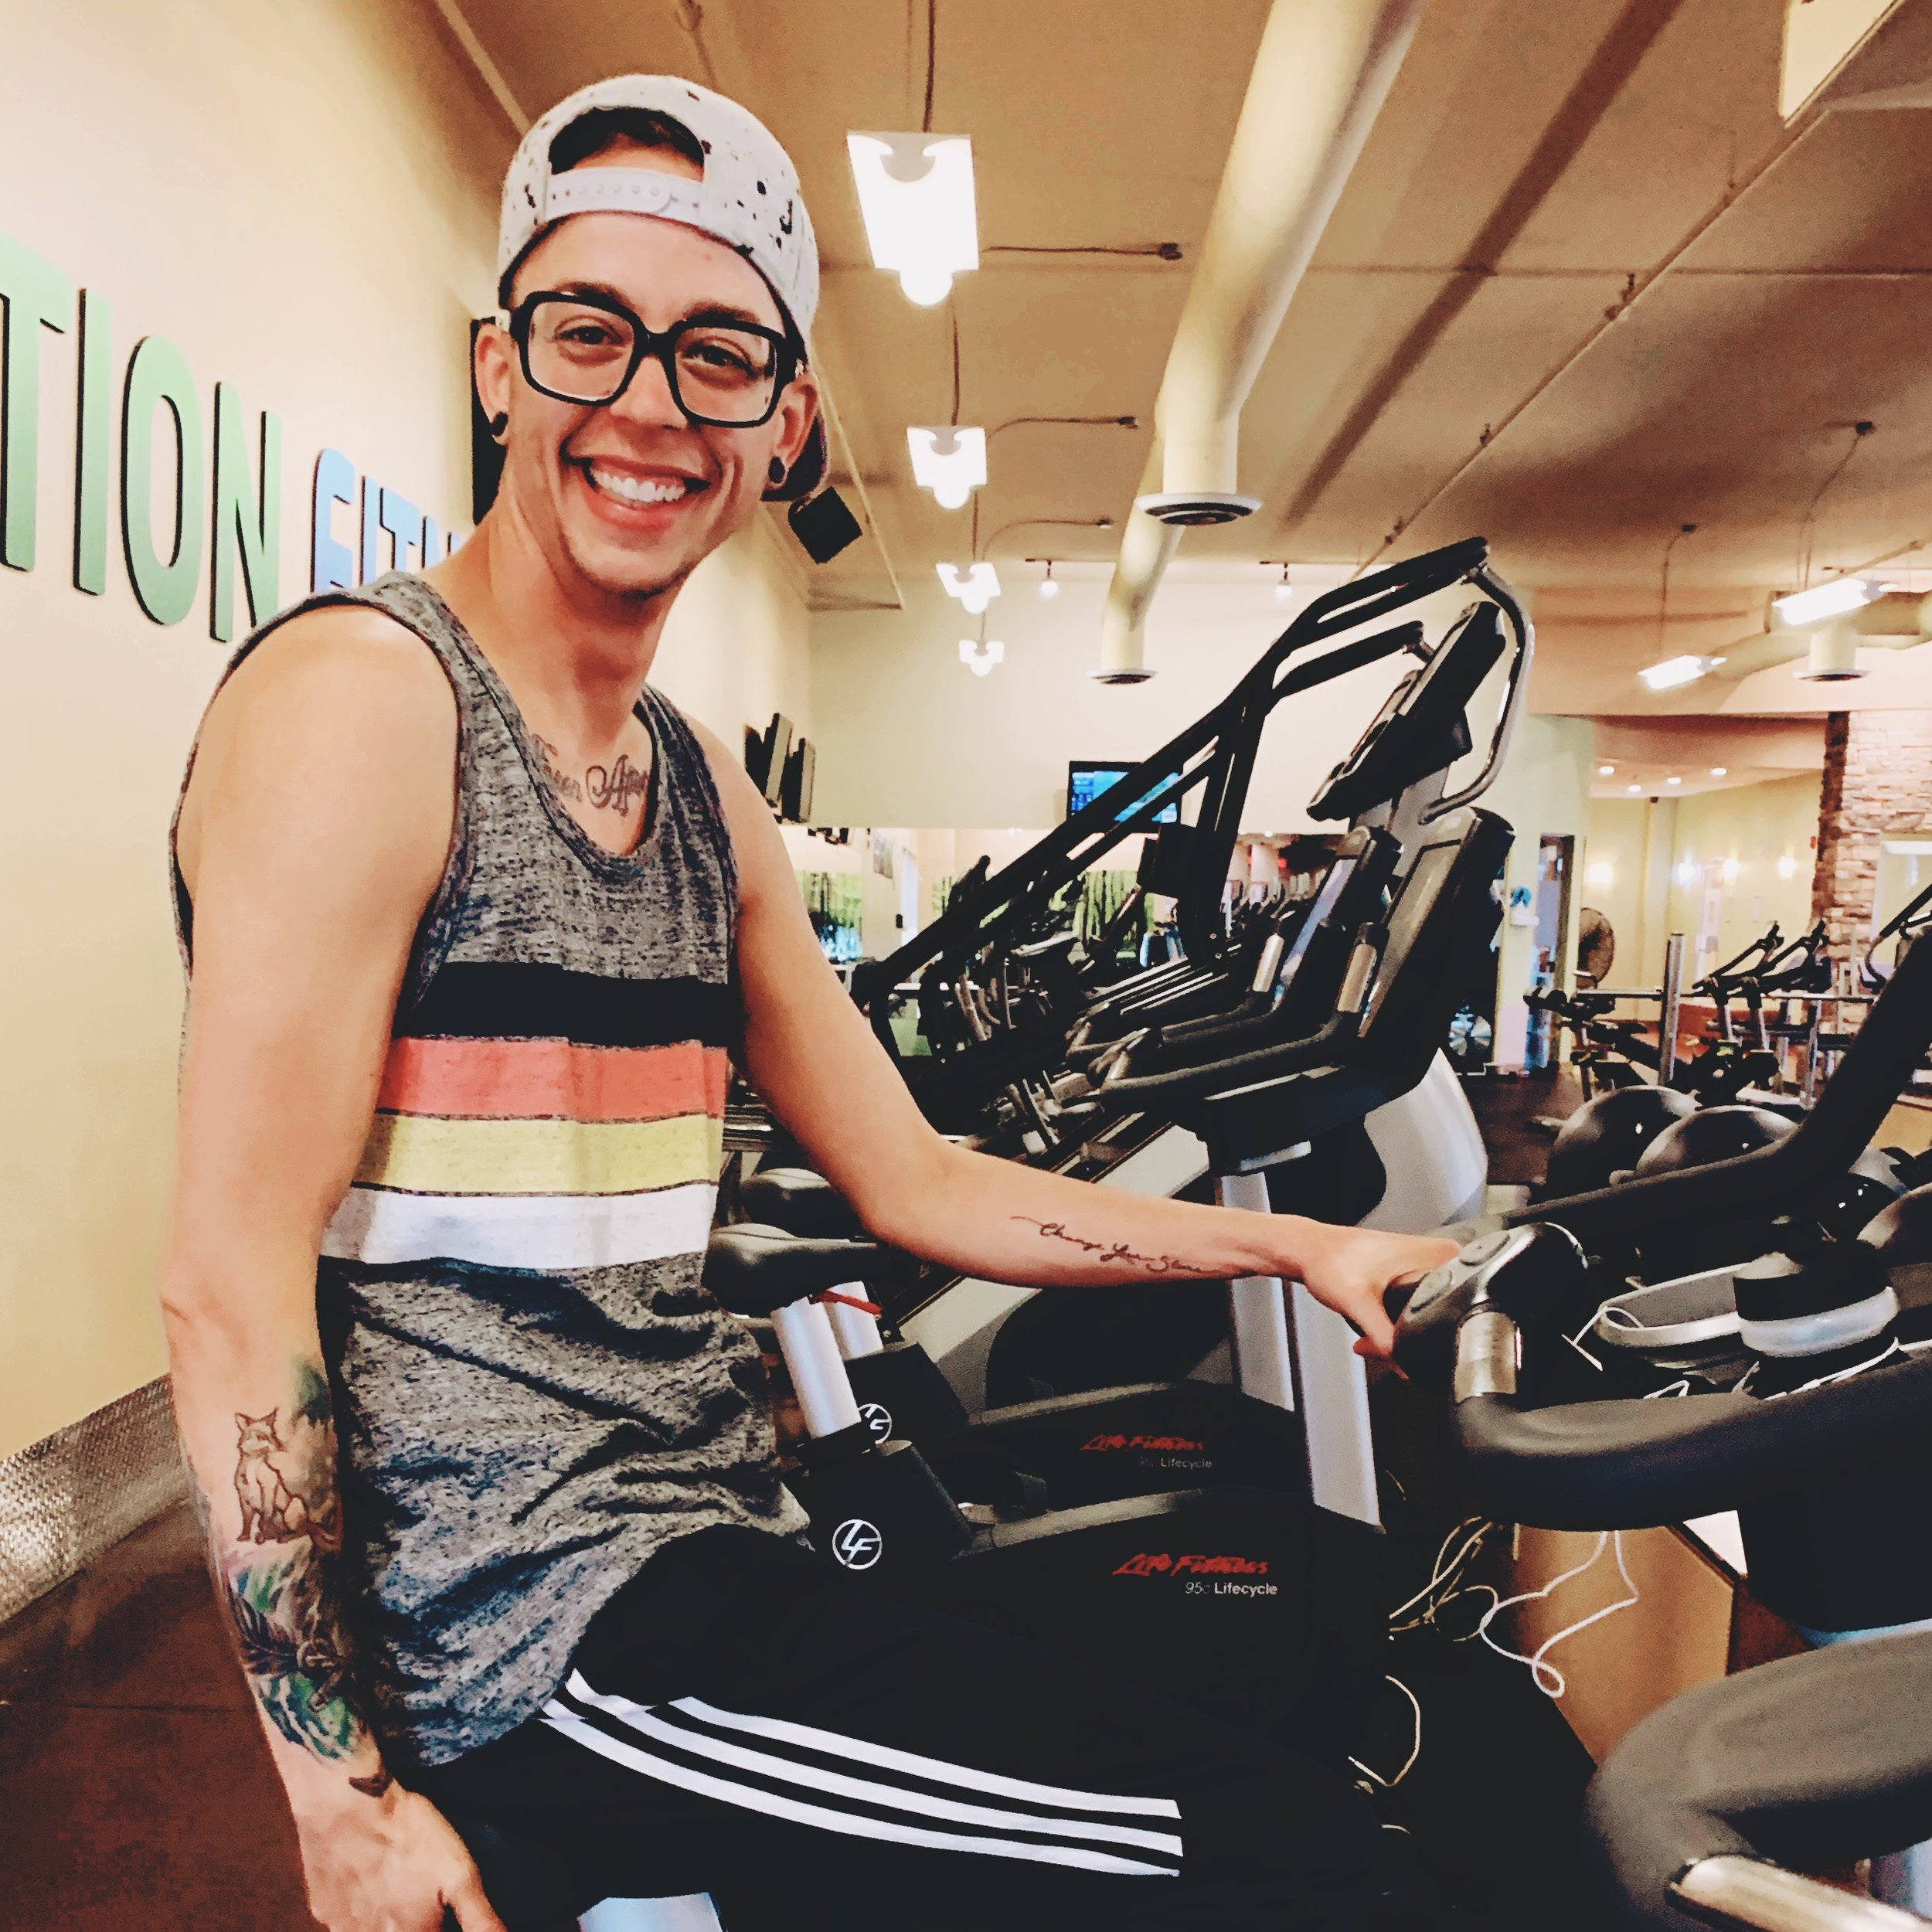 Nick North Transgender Man Working Out